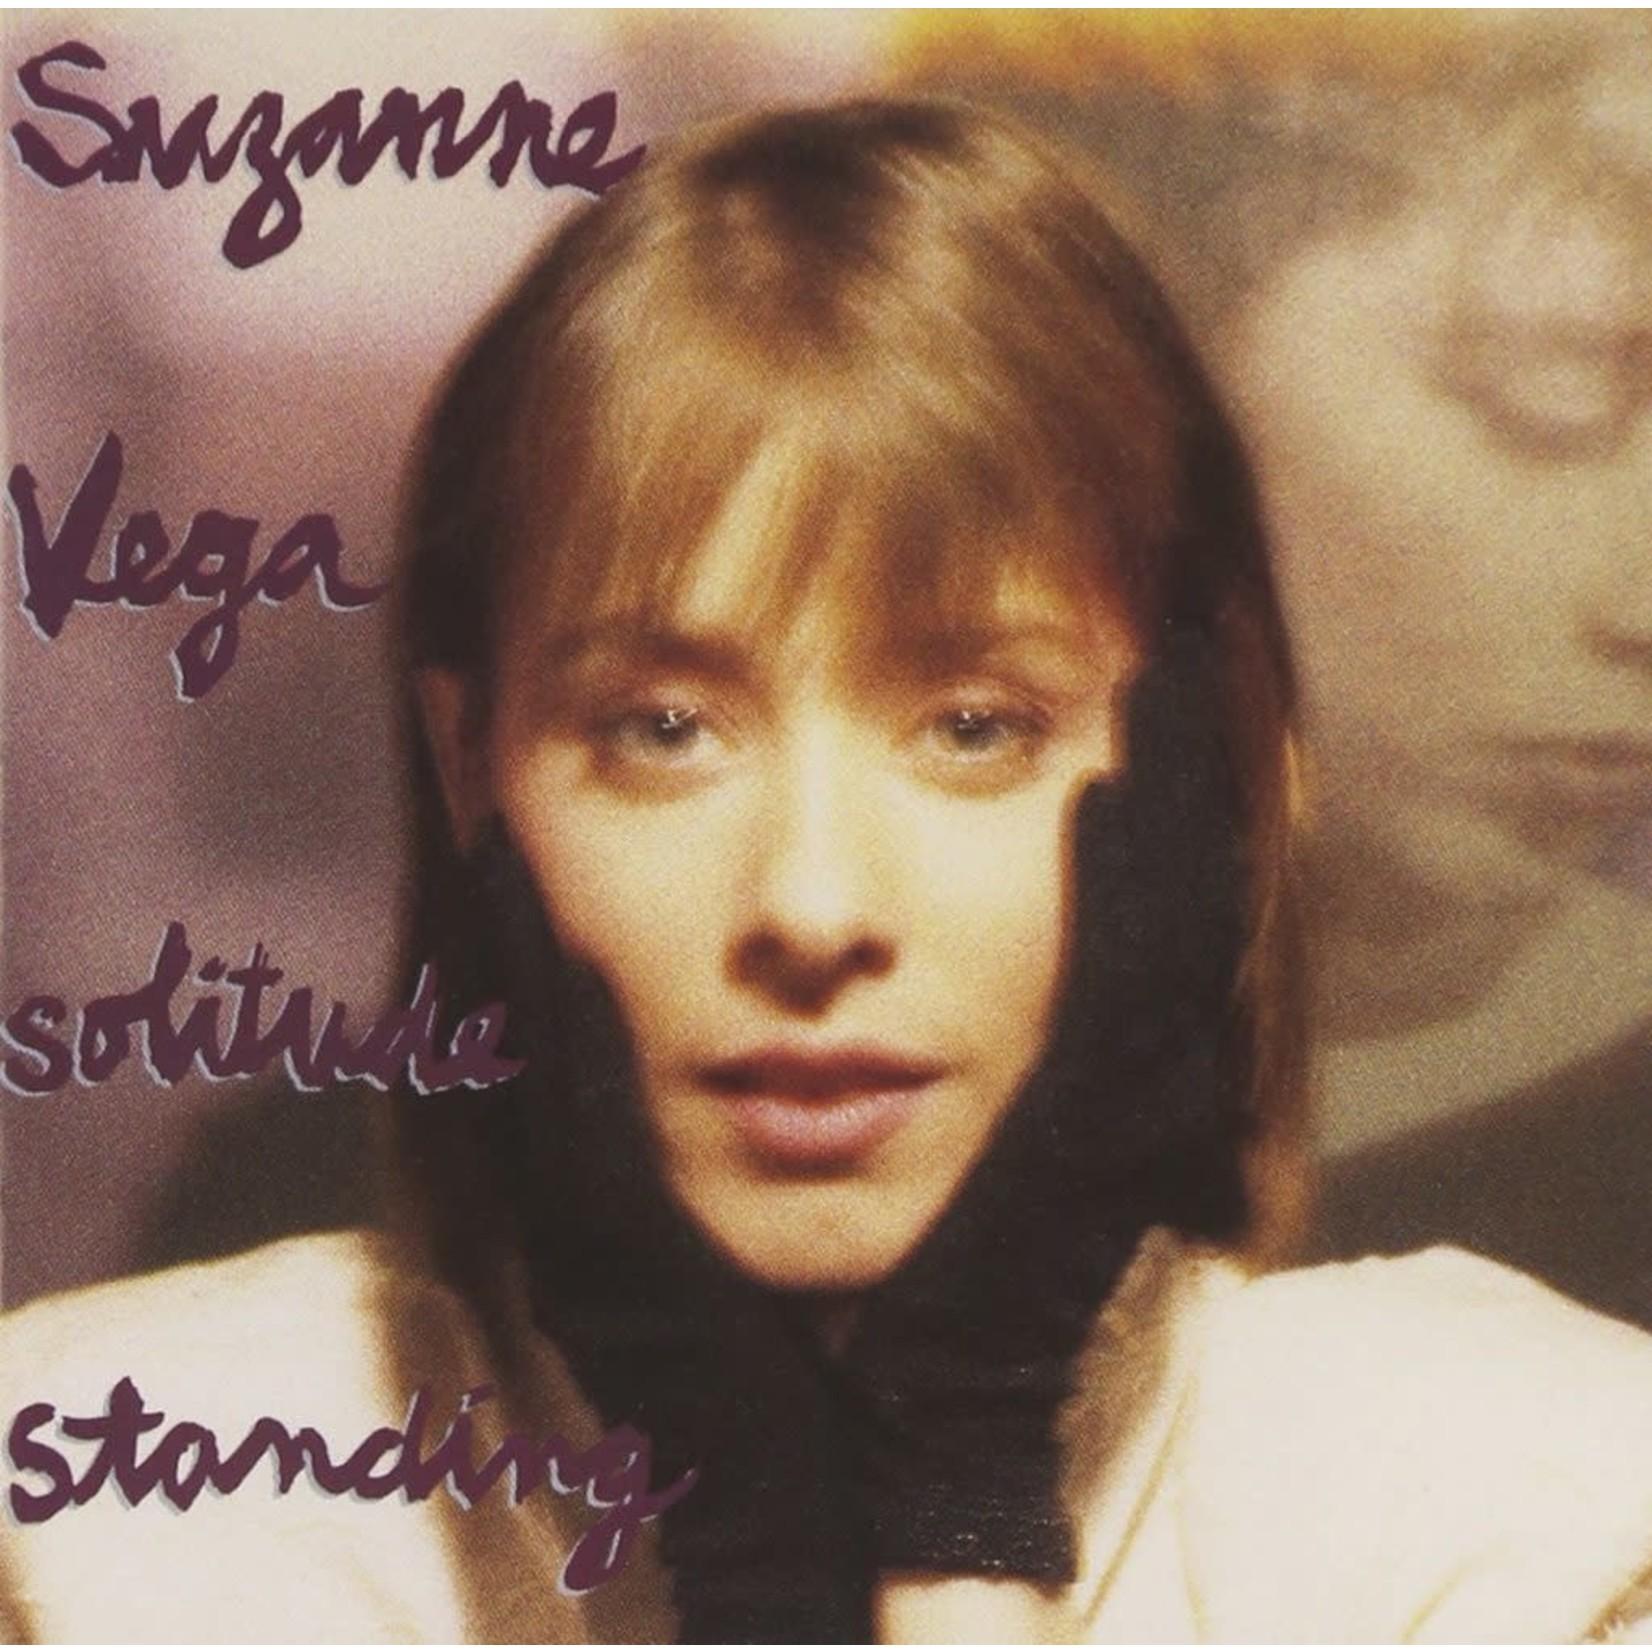 [Vintage] Vega, Suzanne: Solitude Standing